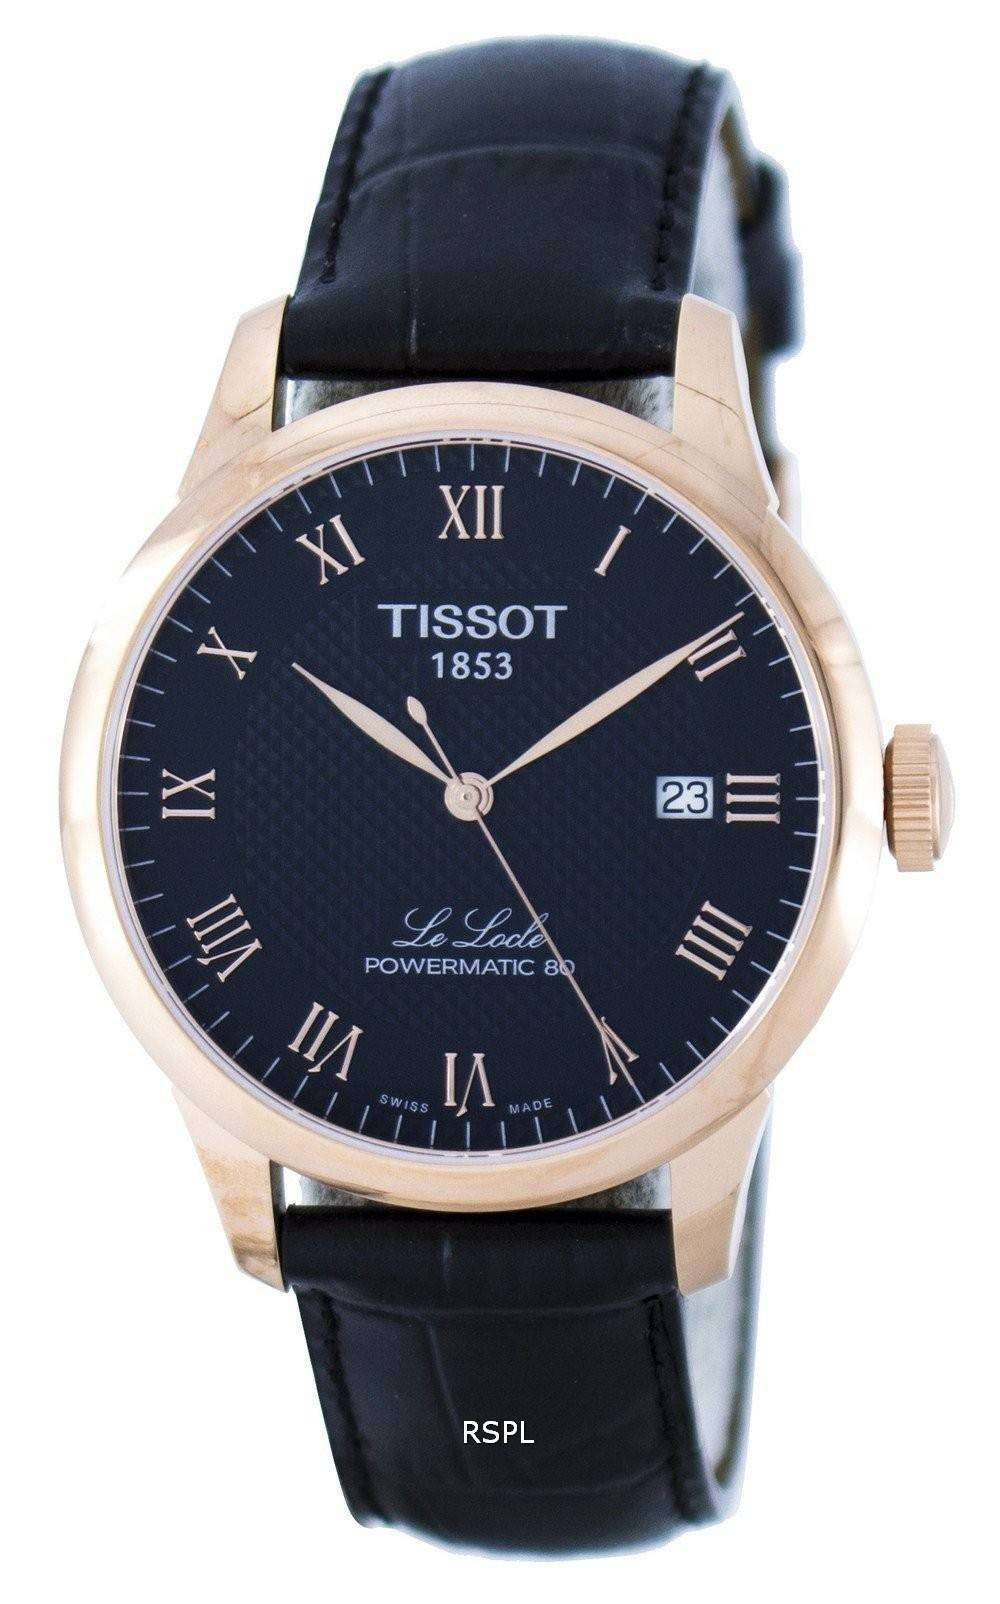 Diesel For Sale >> Tissot T-Classic Le Locle Powermatic 80 T006.407.36.053.00 T0064073605300 Men's Watch ...